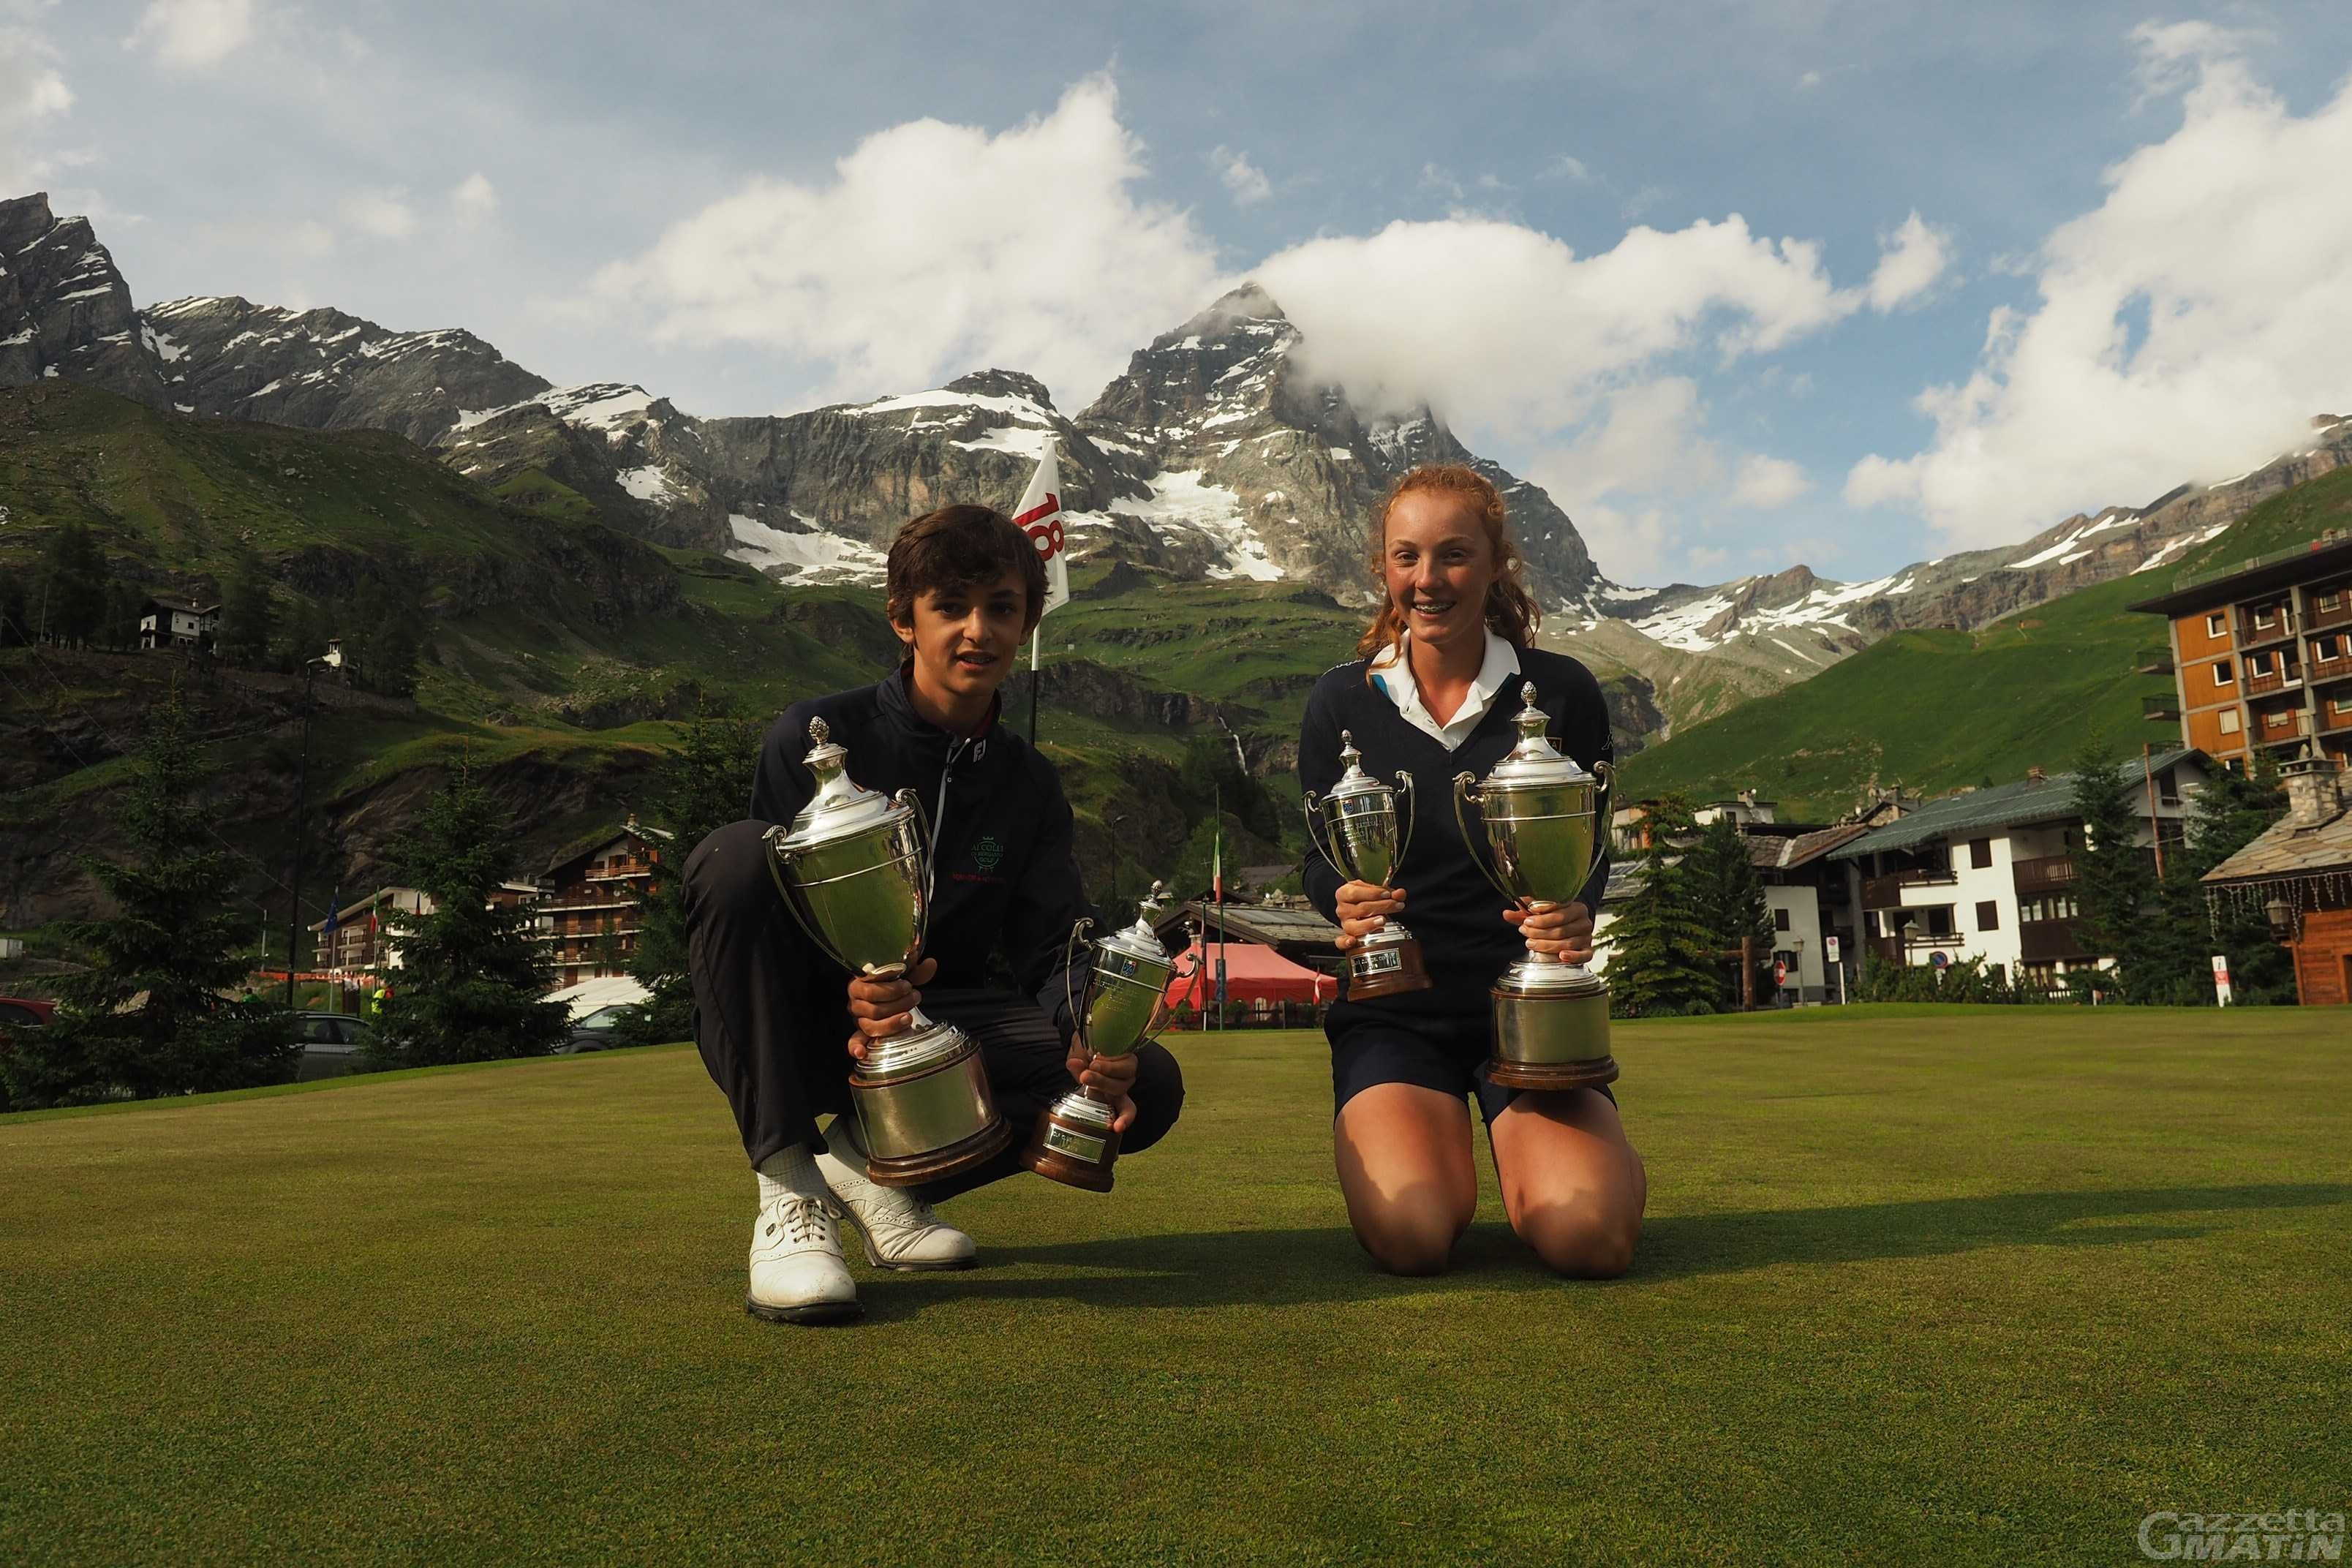 Golf: i campionati italiani Under 14 tornano a Cervinia